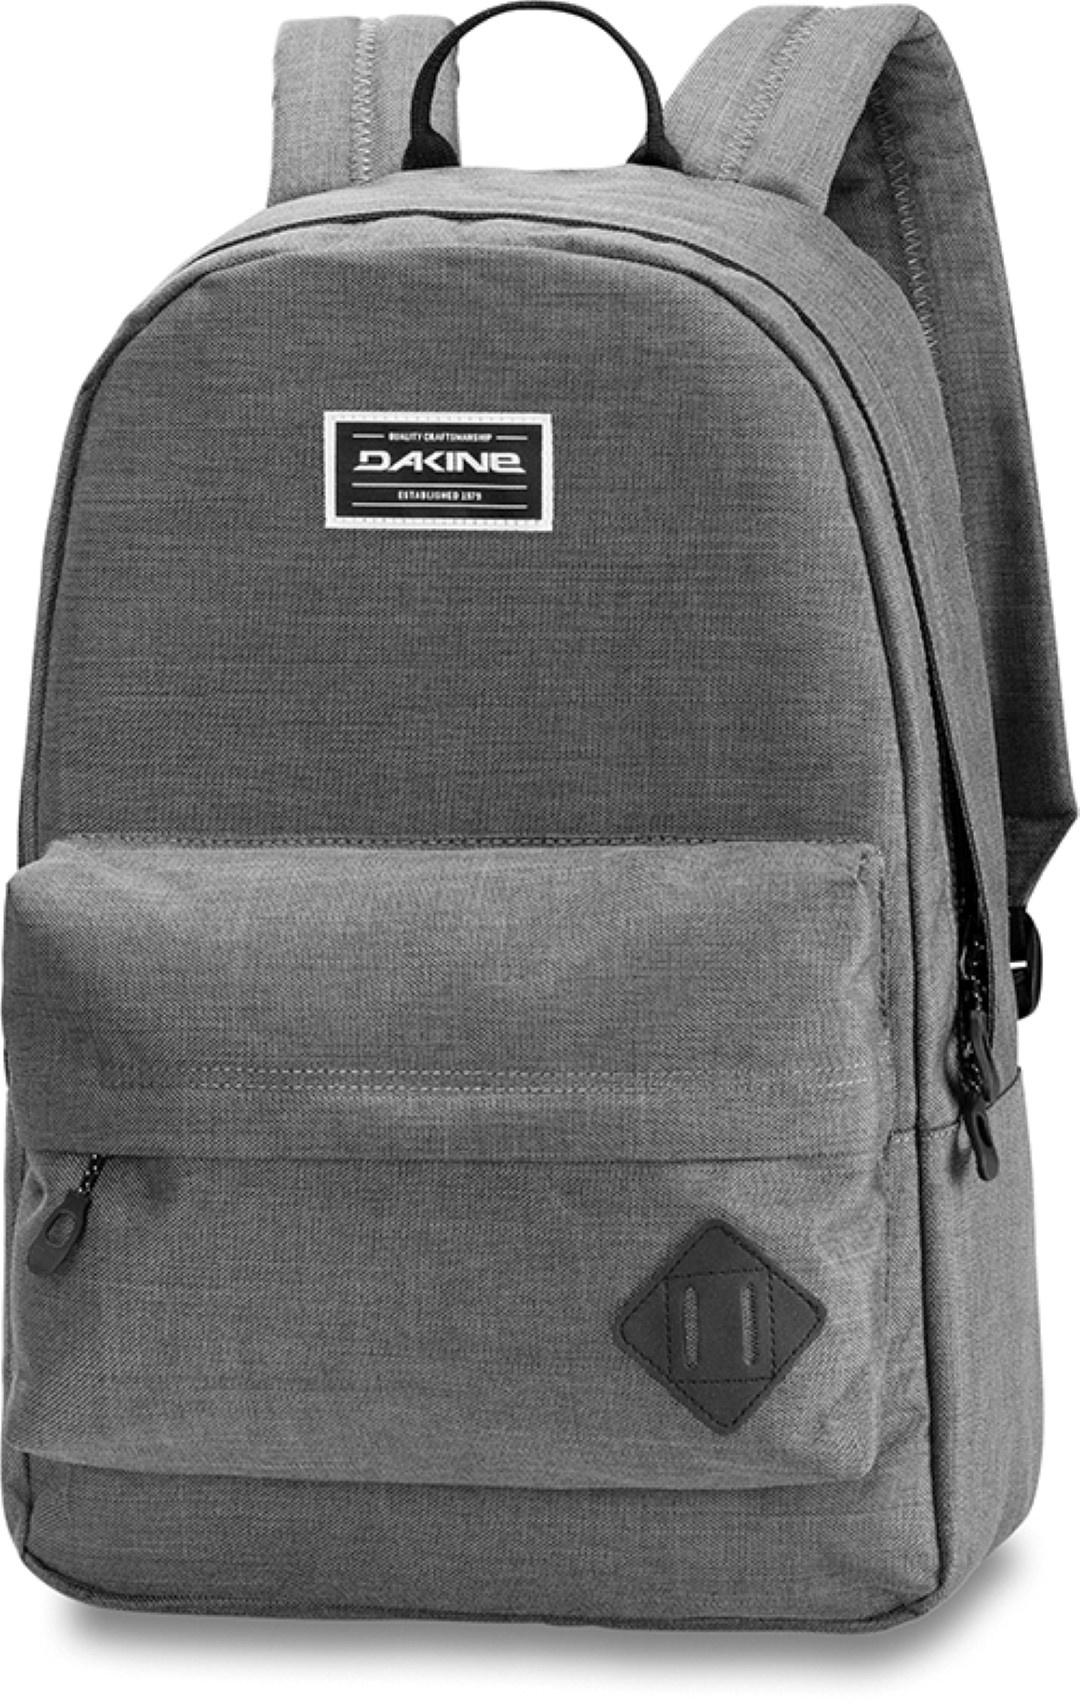 Рюкзак DAKINE DAKINE-08130085, черный